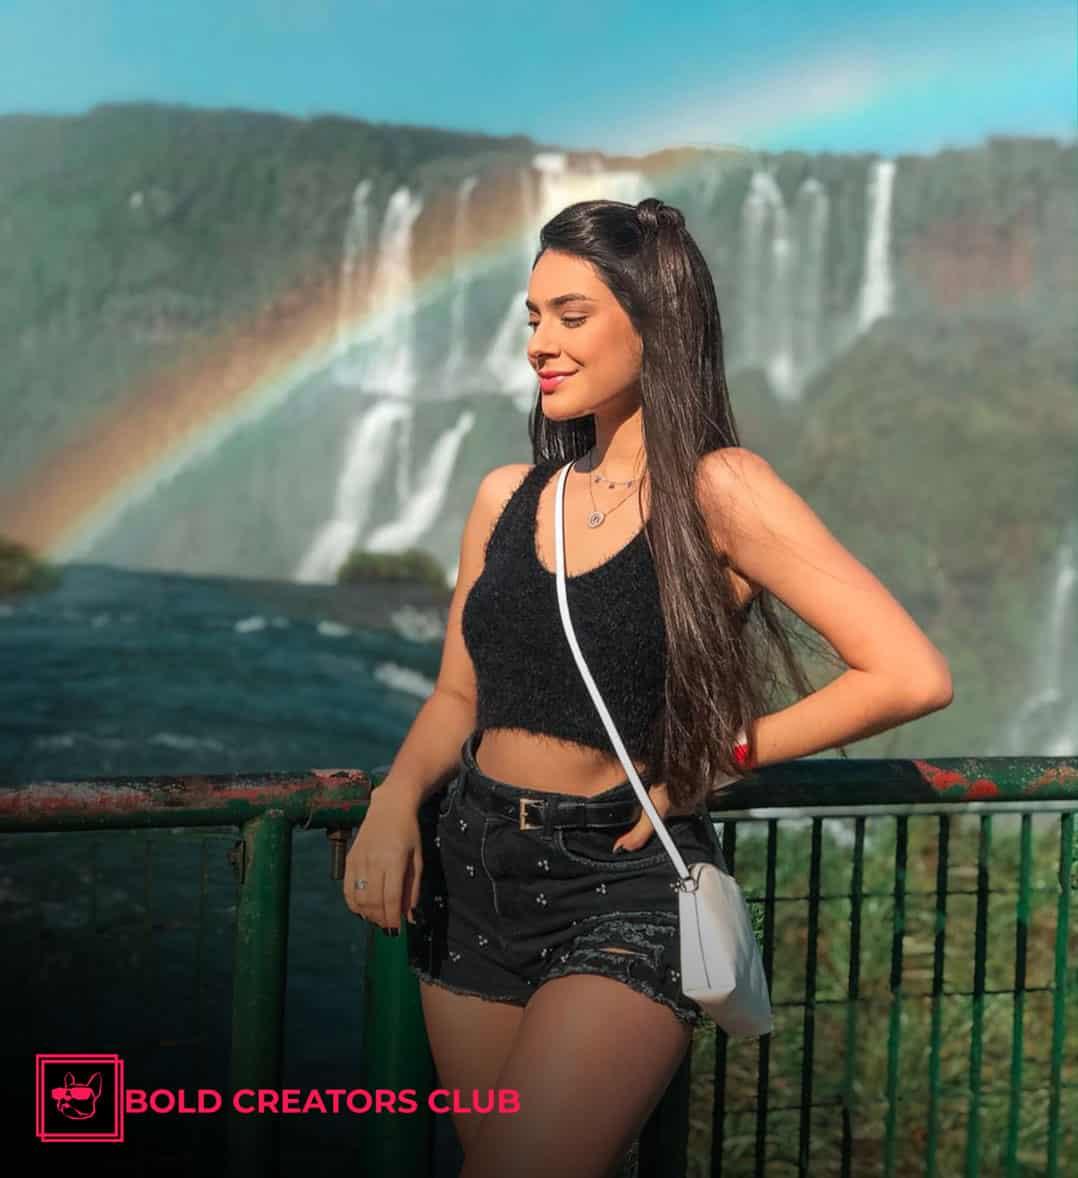 Juliana Leme Bold Creators Club Influencer Marketing Agency South America Brazil